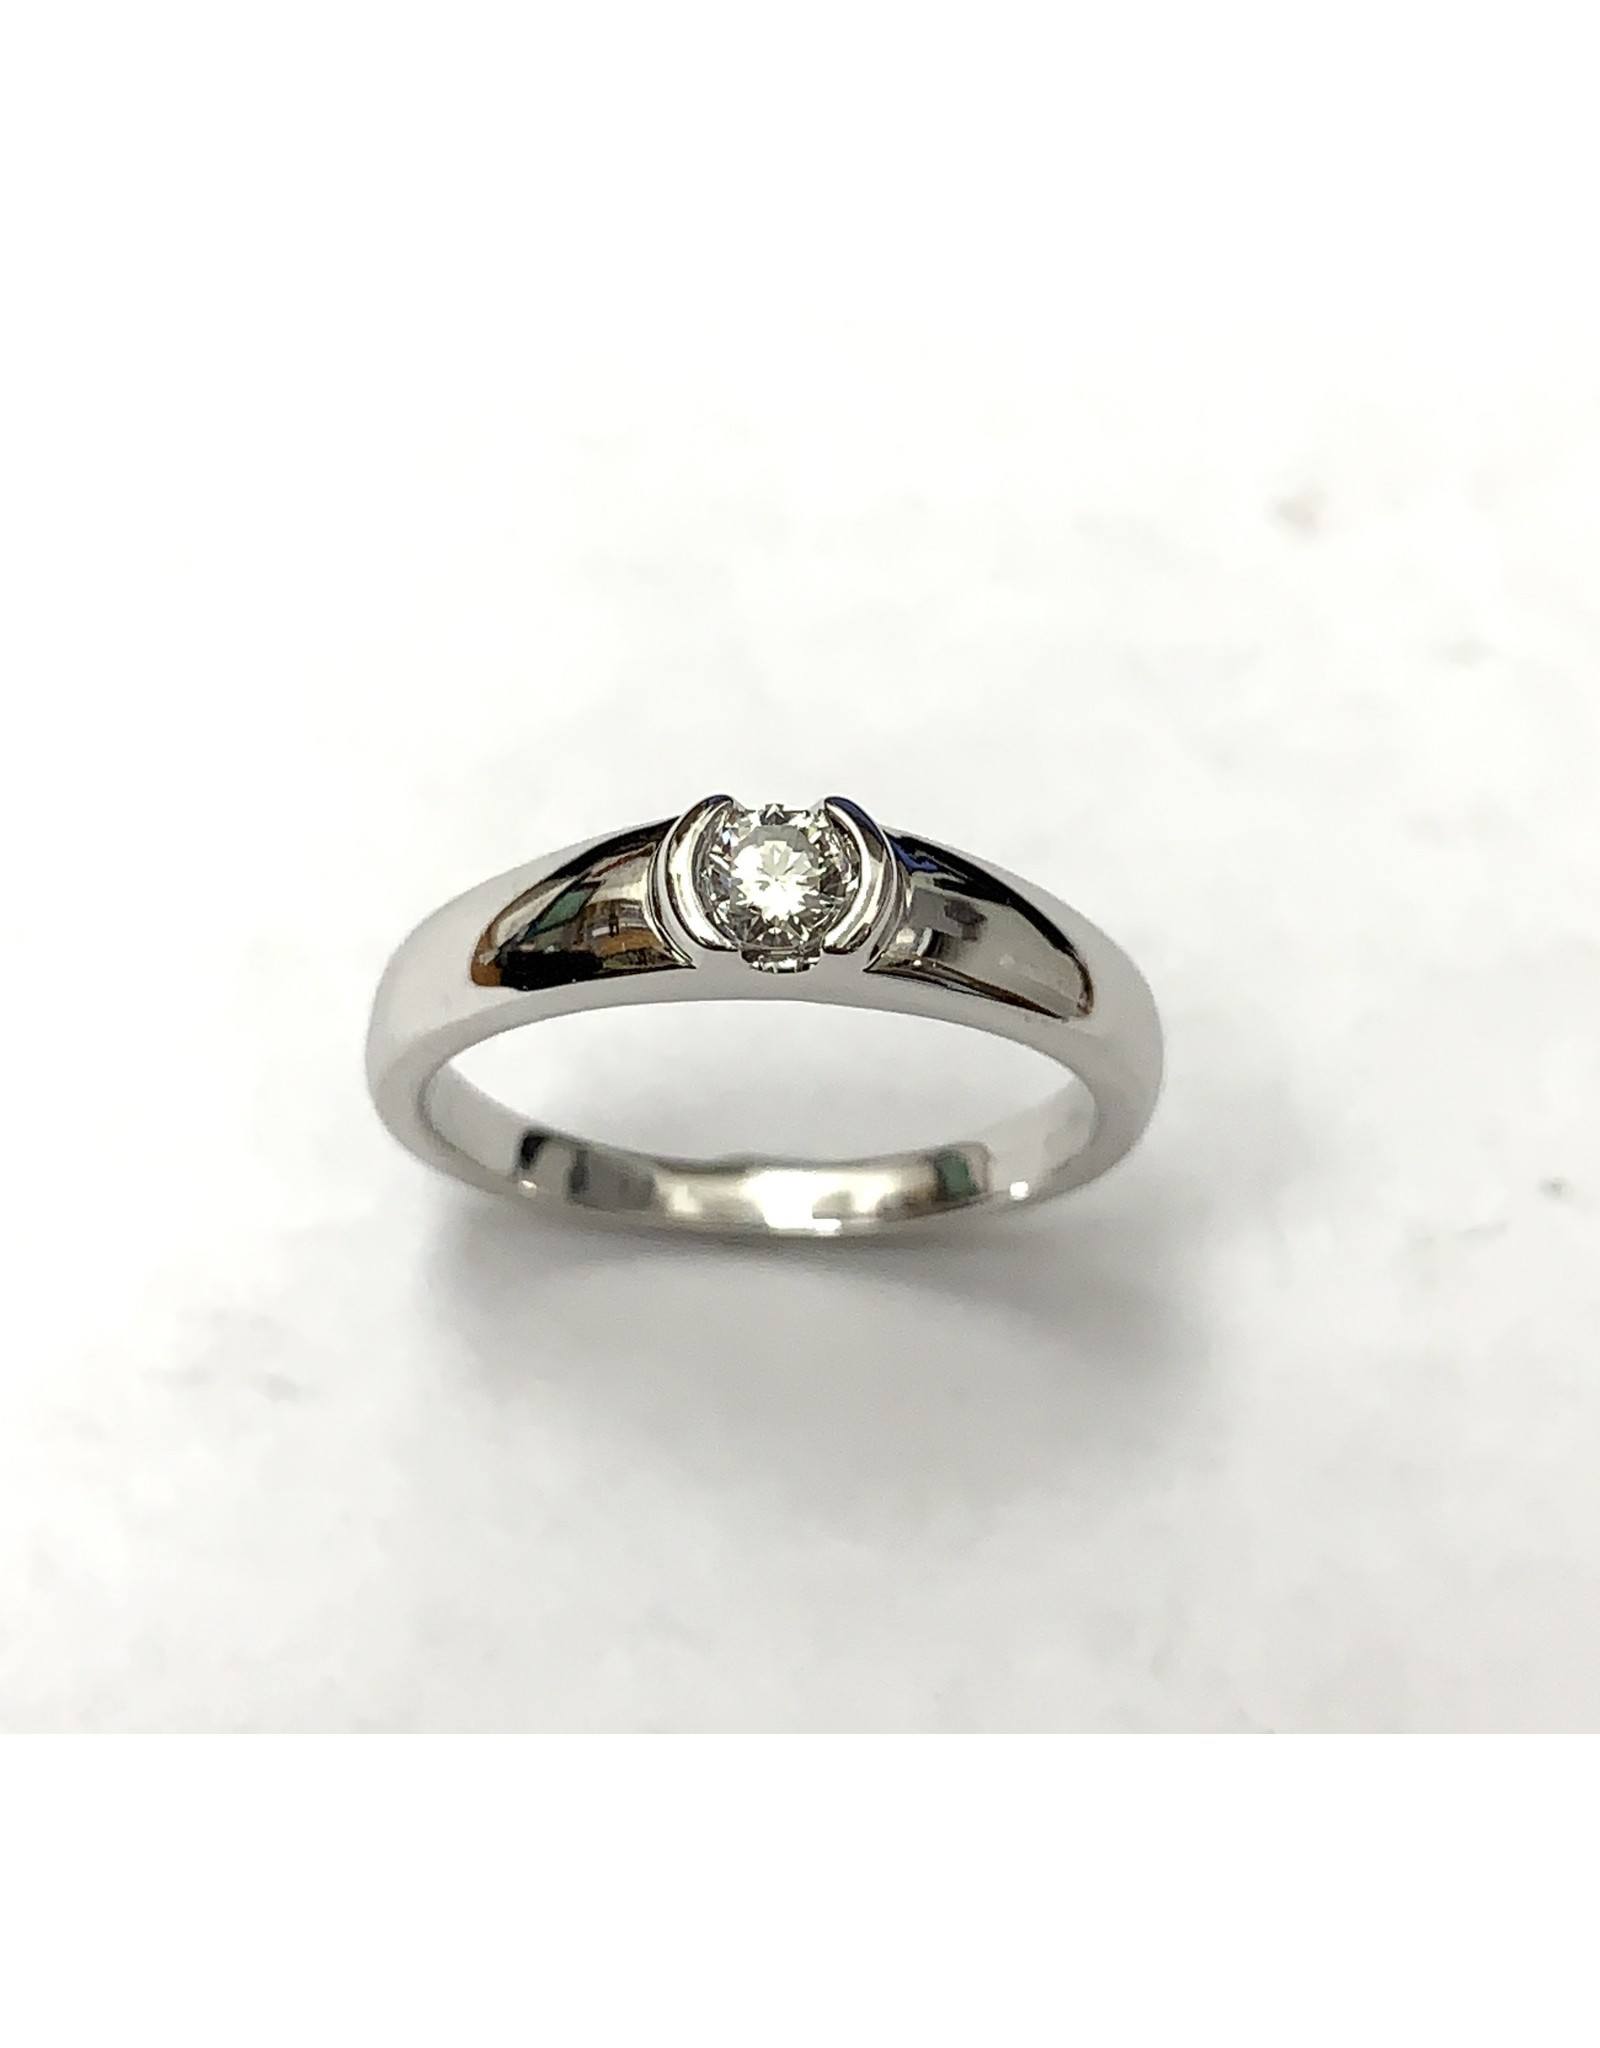 0.17ct Canadian Diamond Ring 14KW